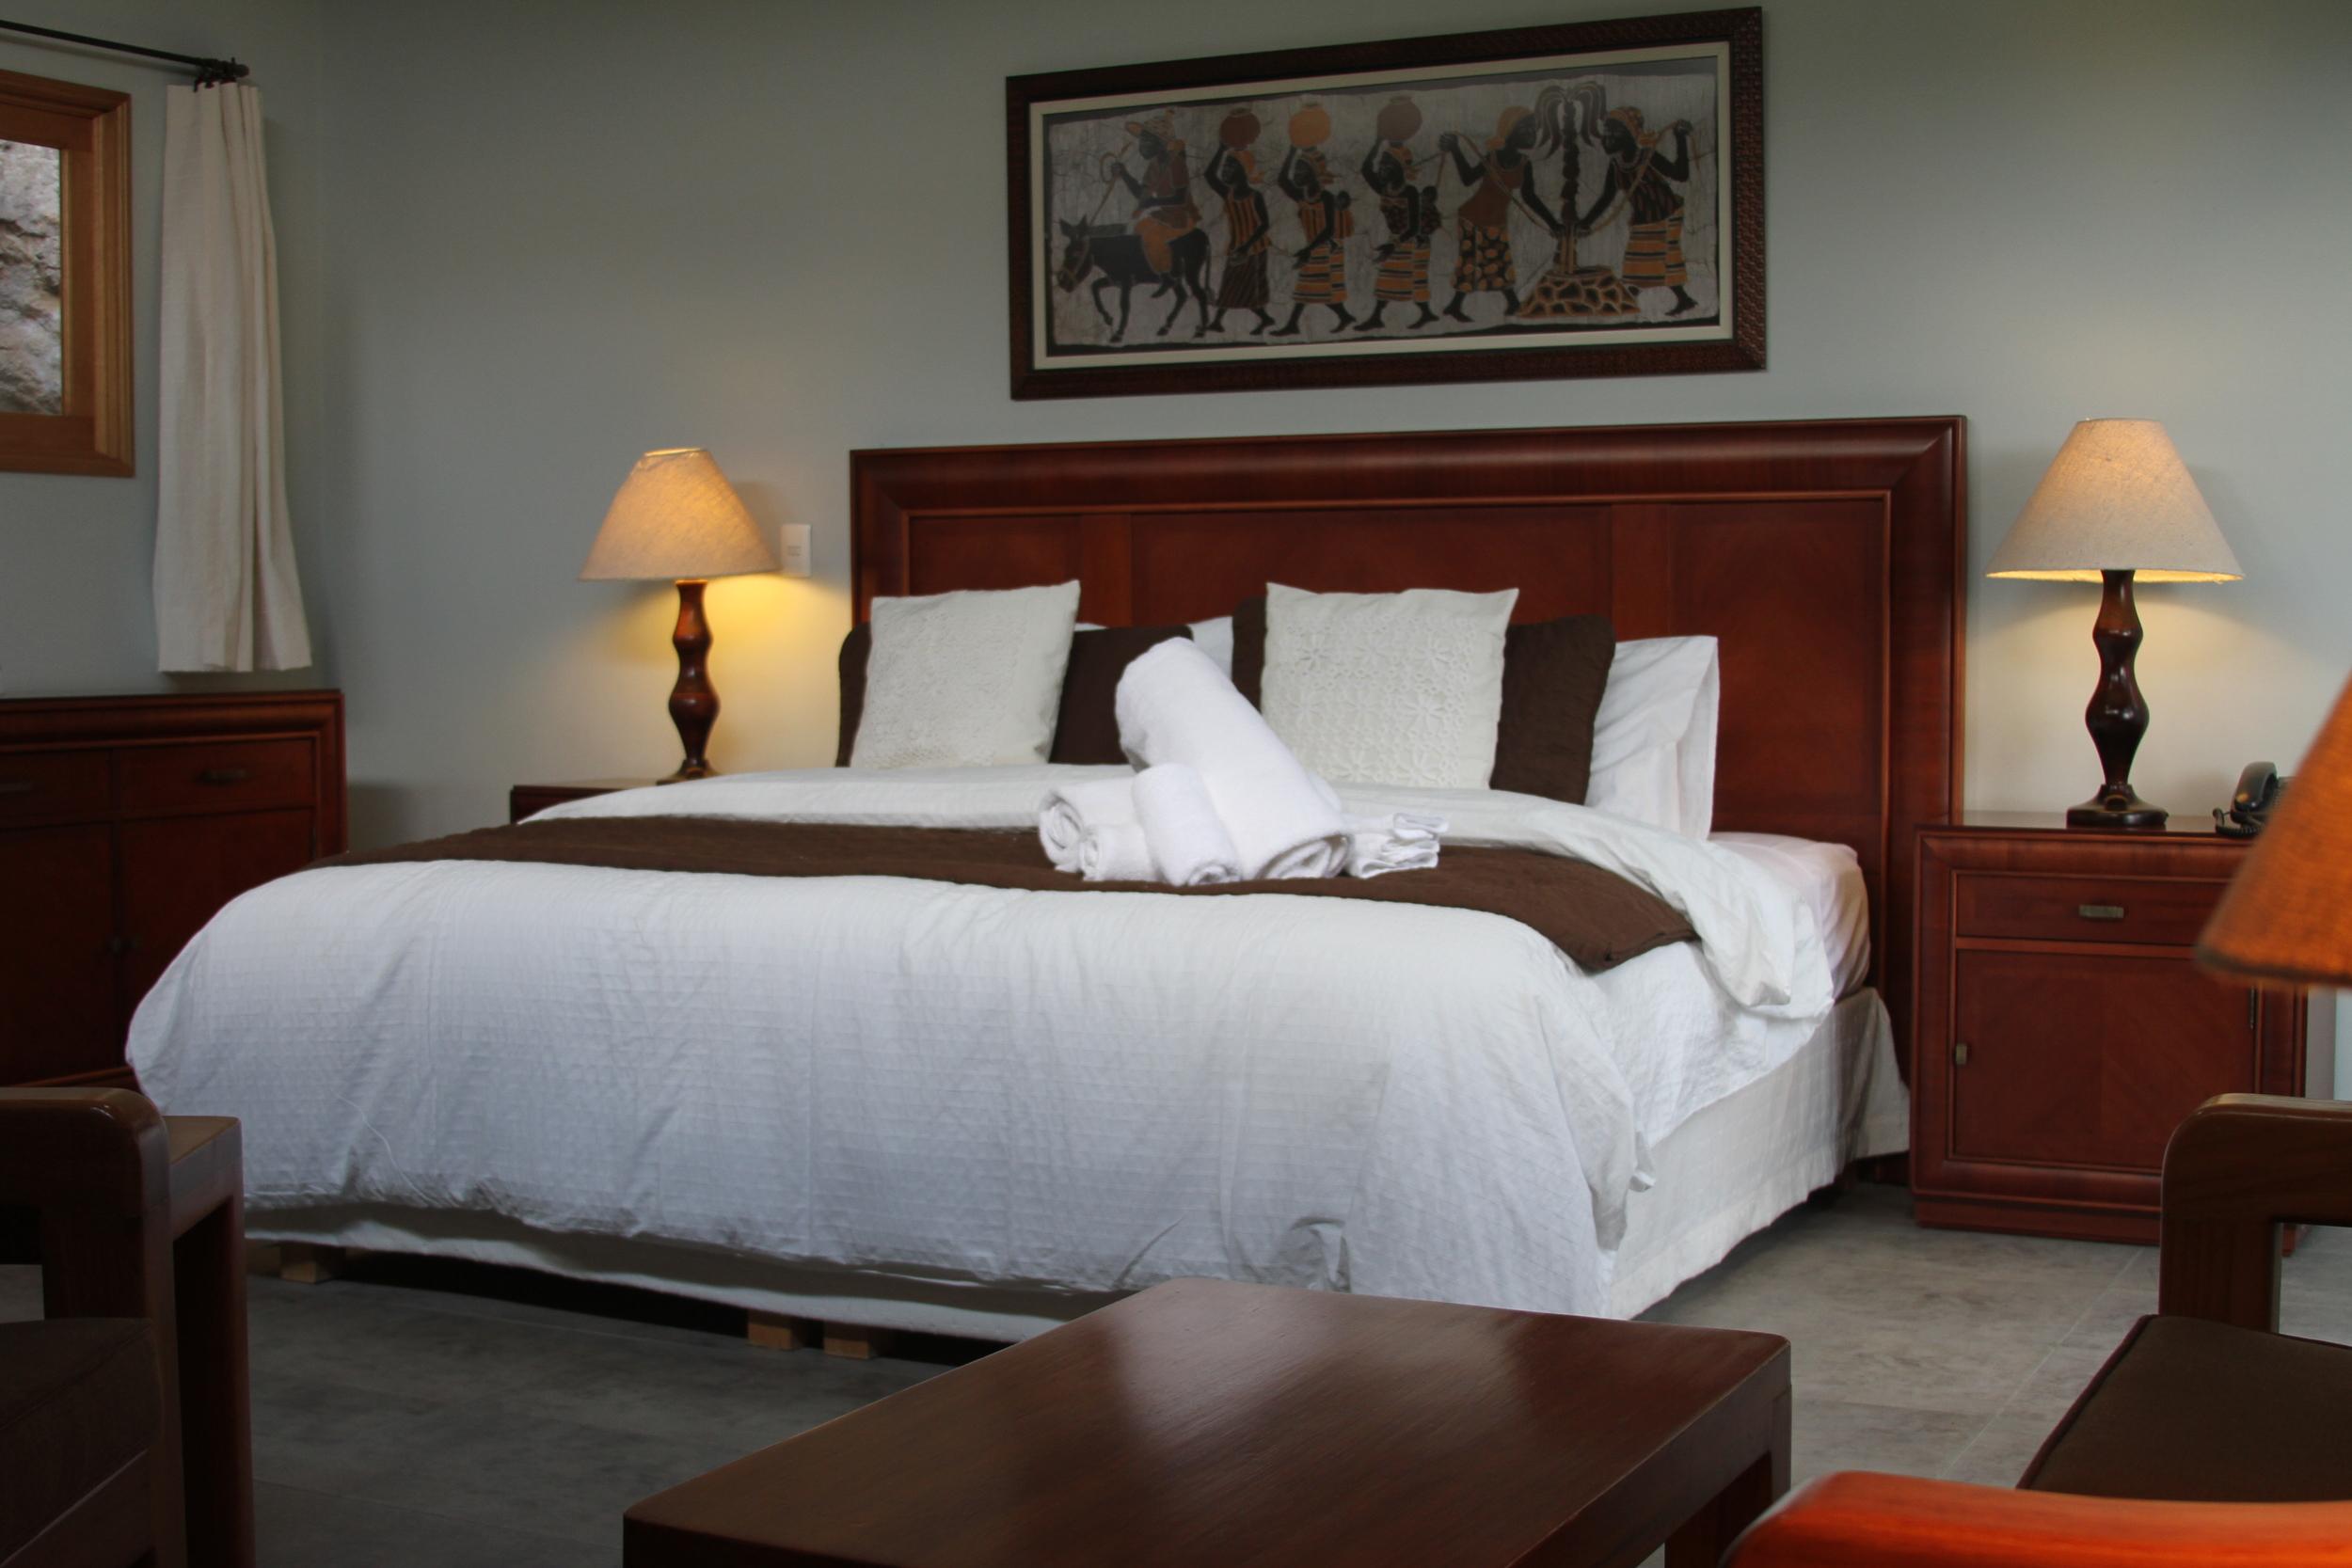 Jade Hotel Room in Malinalco, Mexico